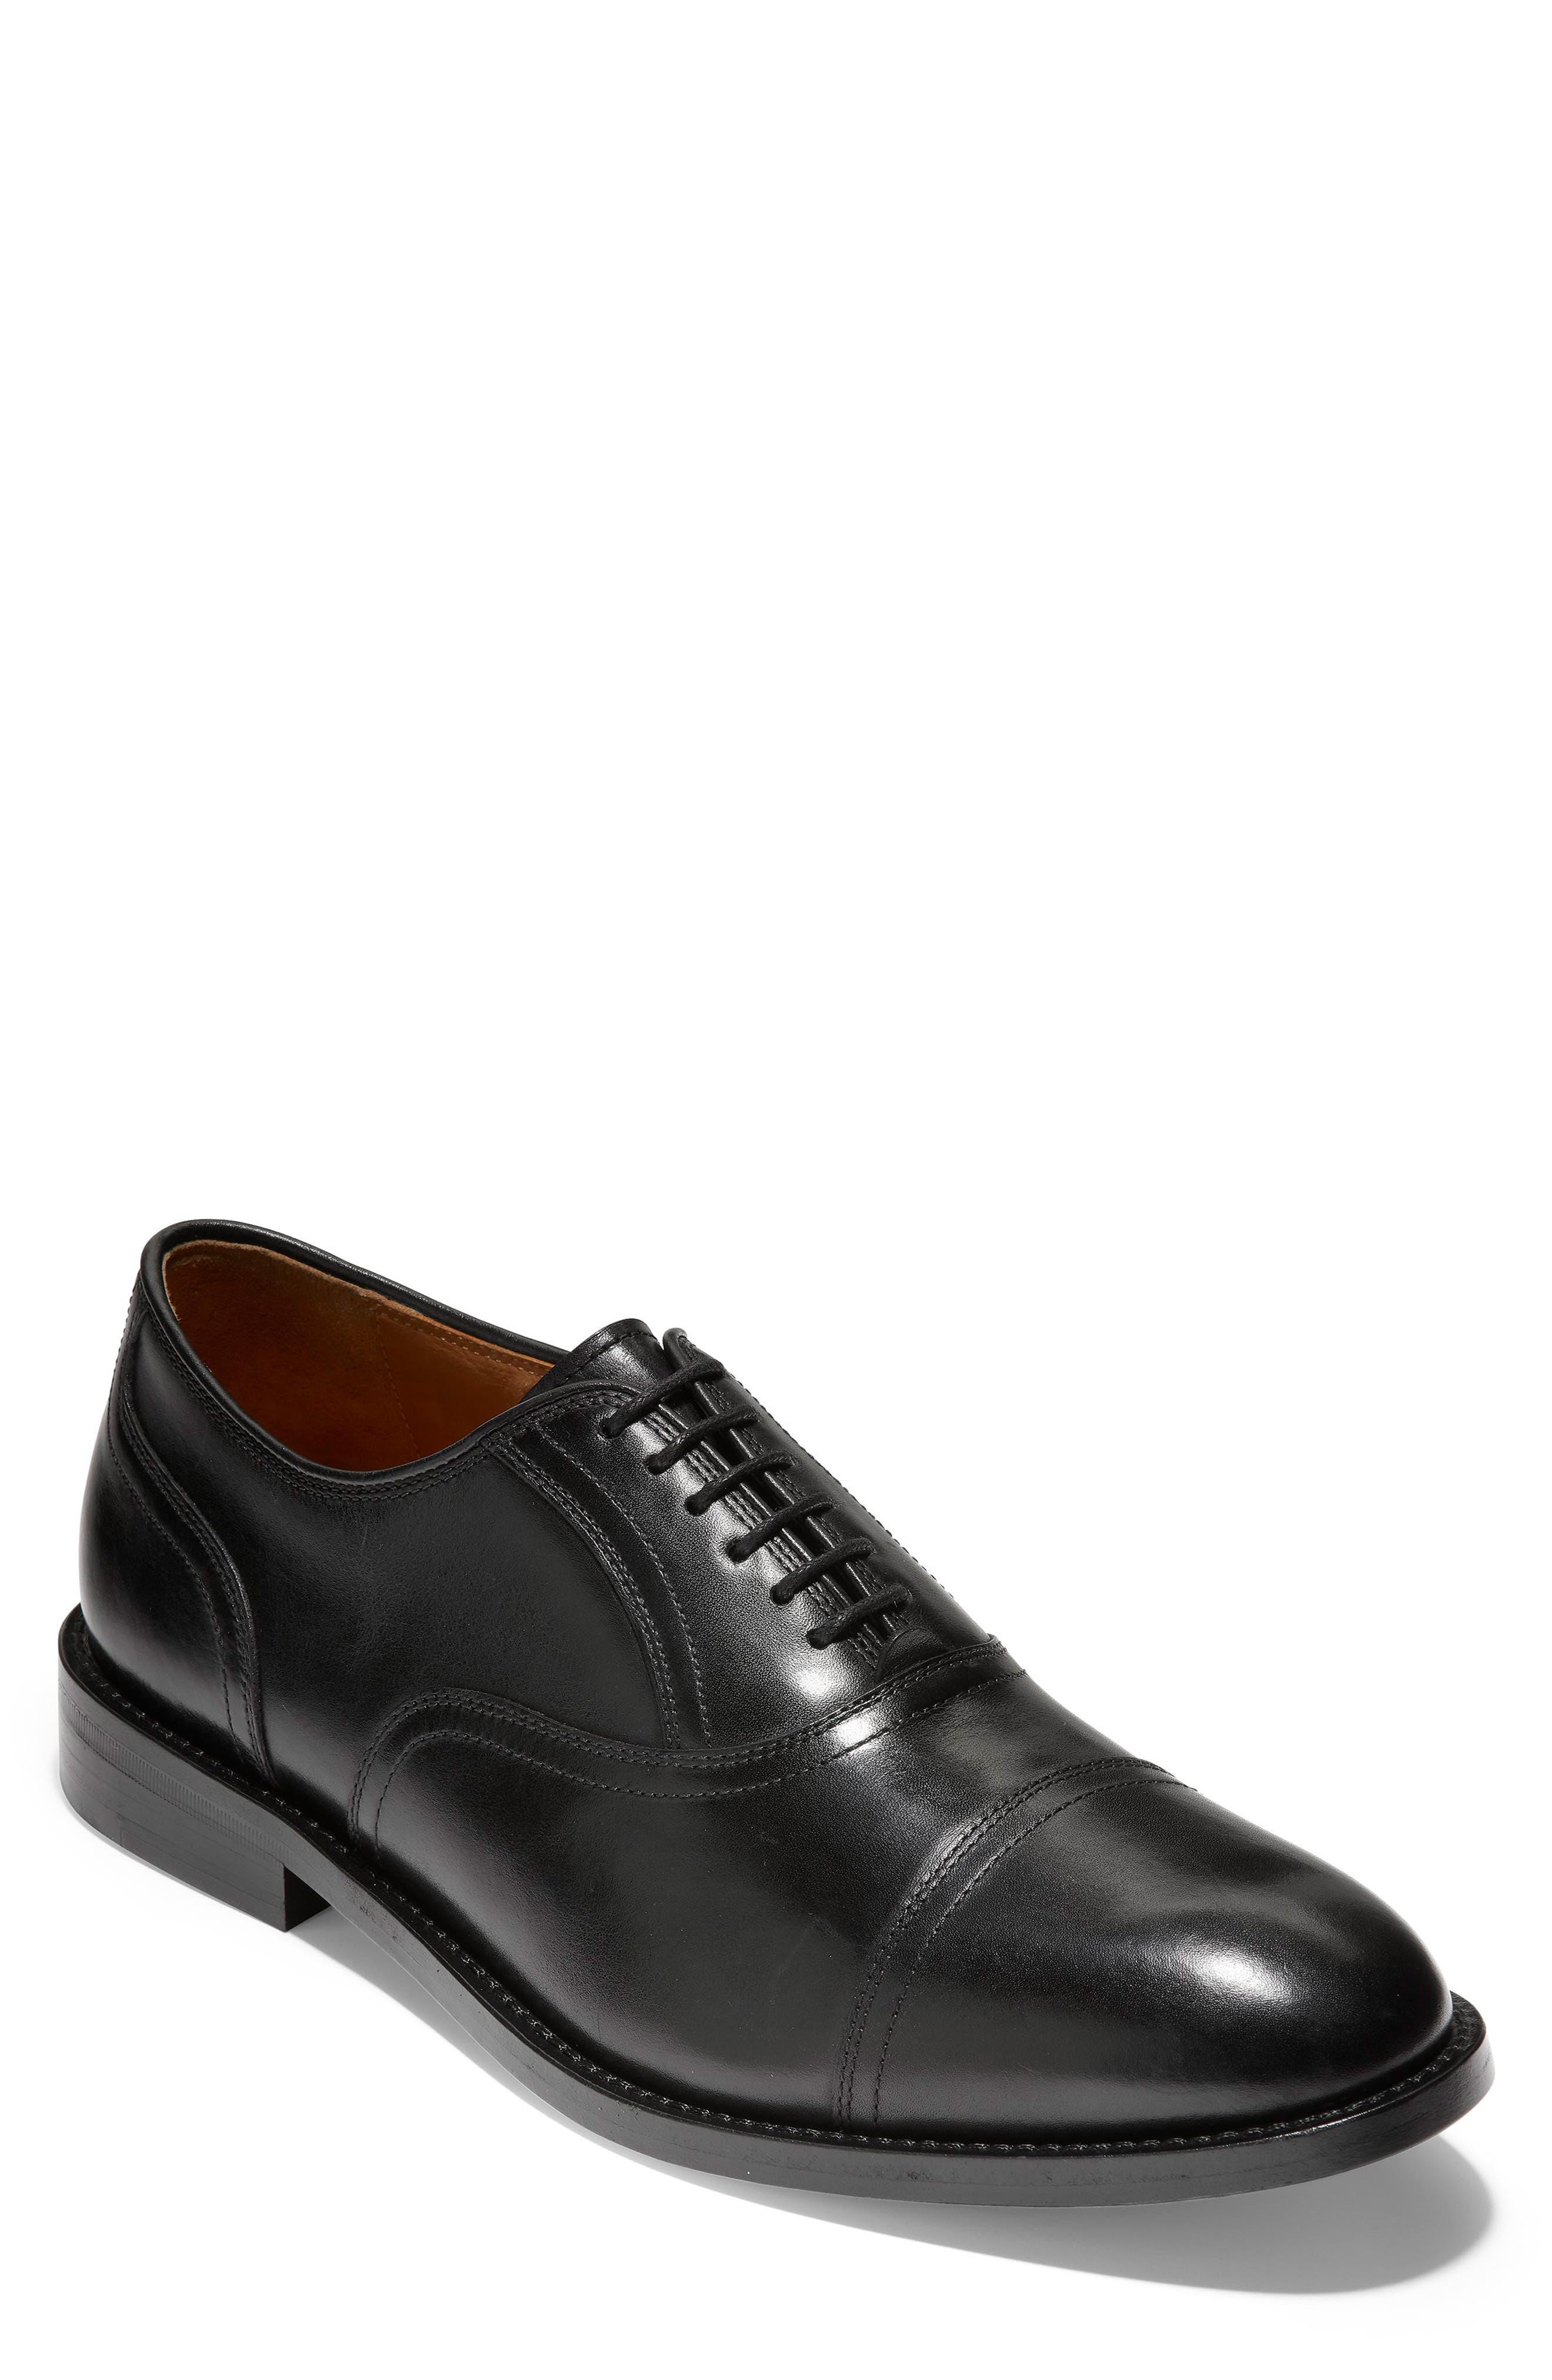 COLE HAAN American Classics Kneeland Cap Toe Oxford, Main, color, BLACK LEATHER